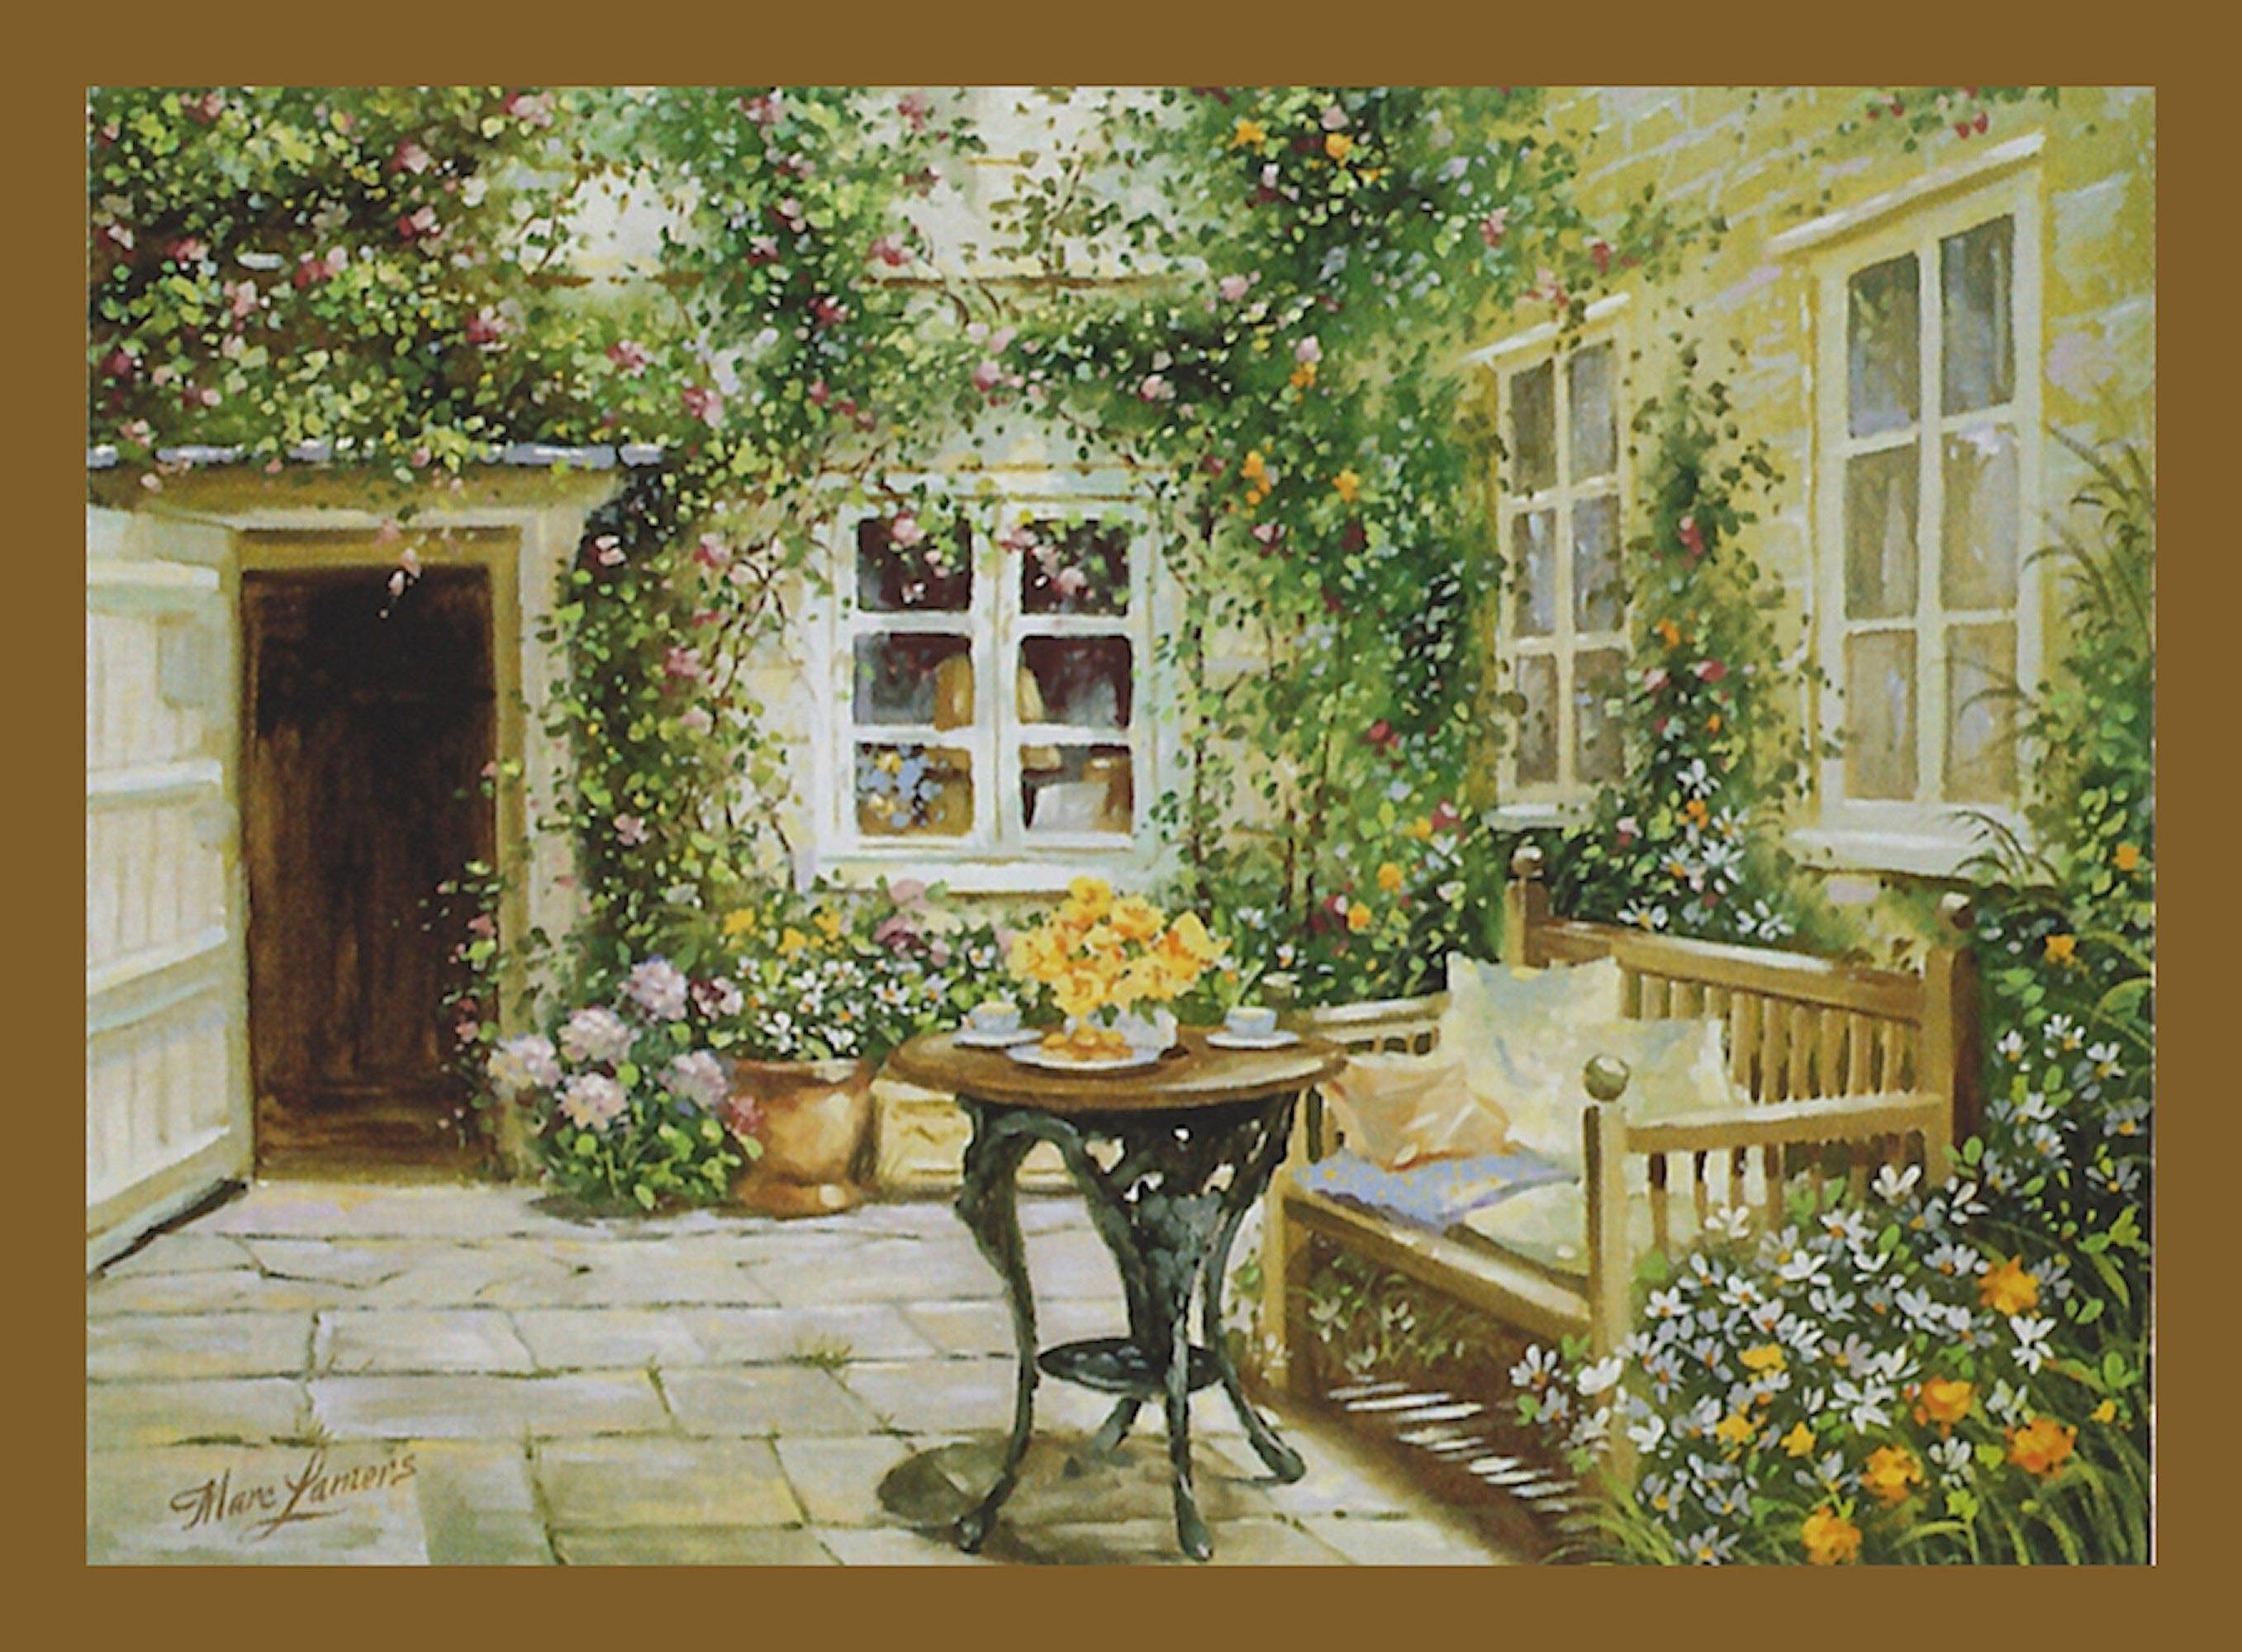 Home affaire Wandbild »Courtyard tranquility«, mit Rahmen